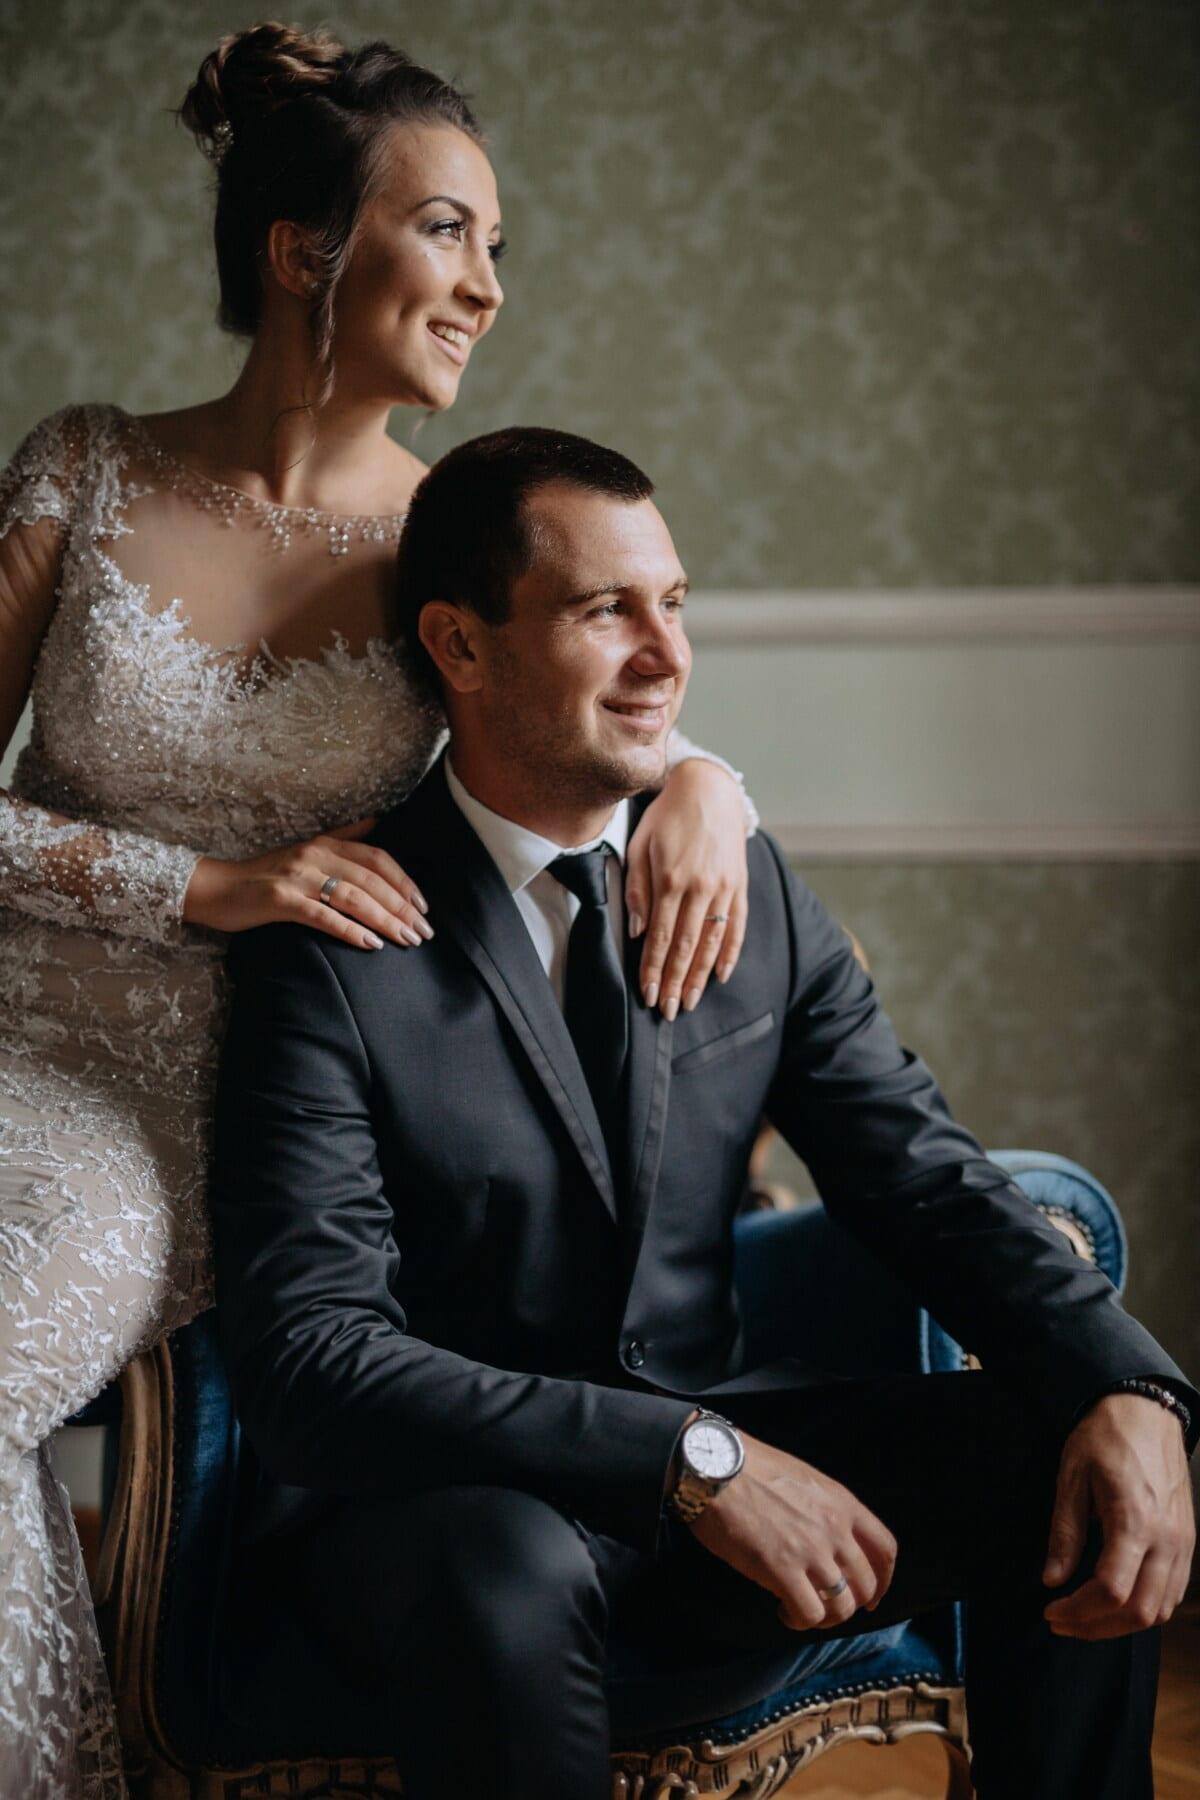 husband, wife, fancy, dress, posing, tuxedo suit, sitting, armchair, glamour, suit